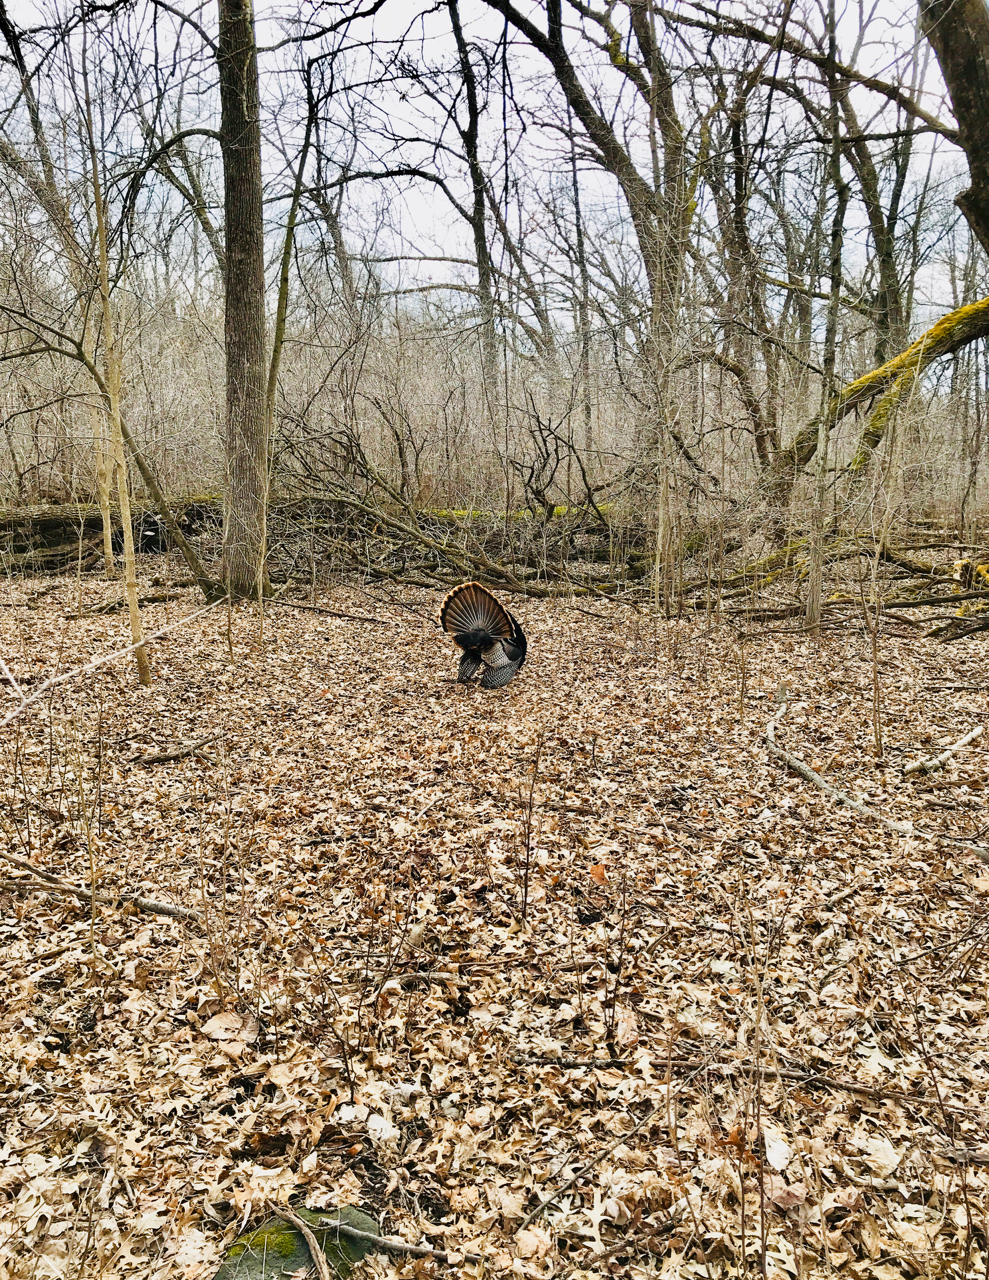 Tom in a Clearing. UW Arboretum. Madison, Wisconsin. April 2018. © William D. Walker